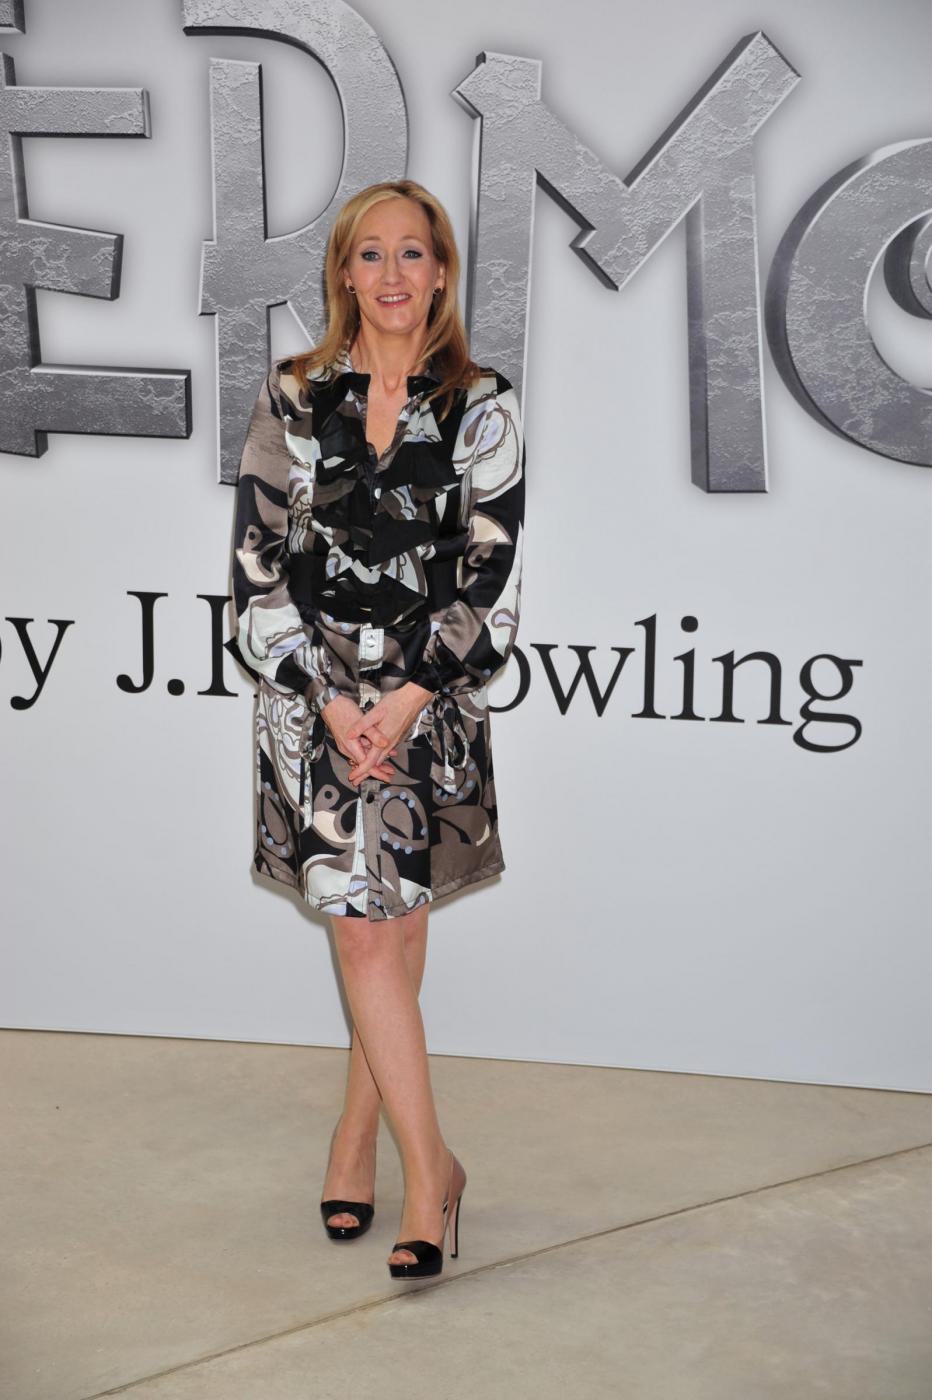 J.K. Rowling, scrittrice